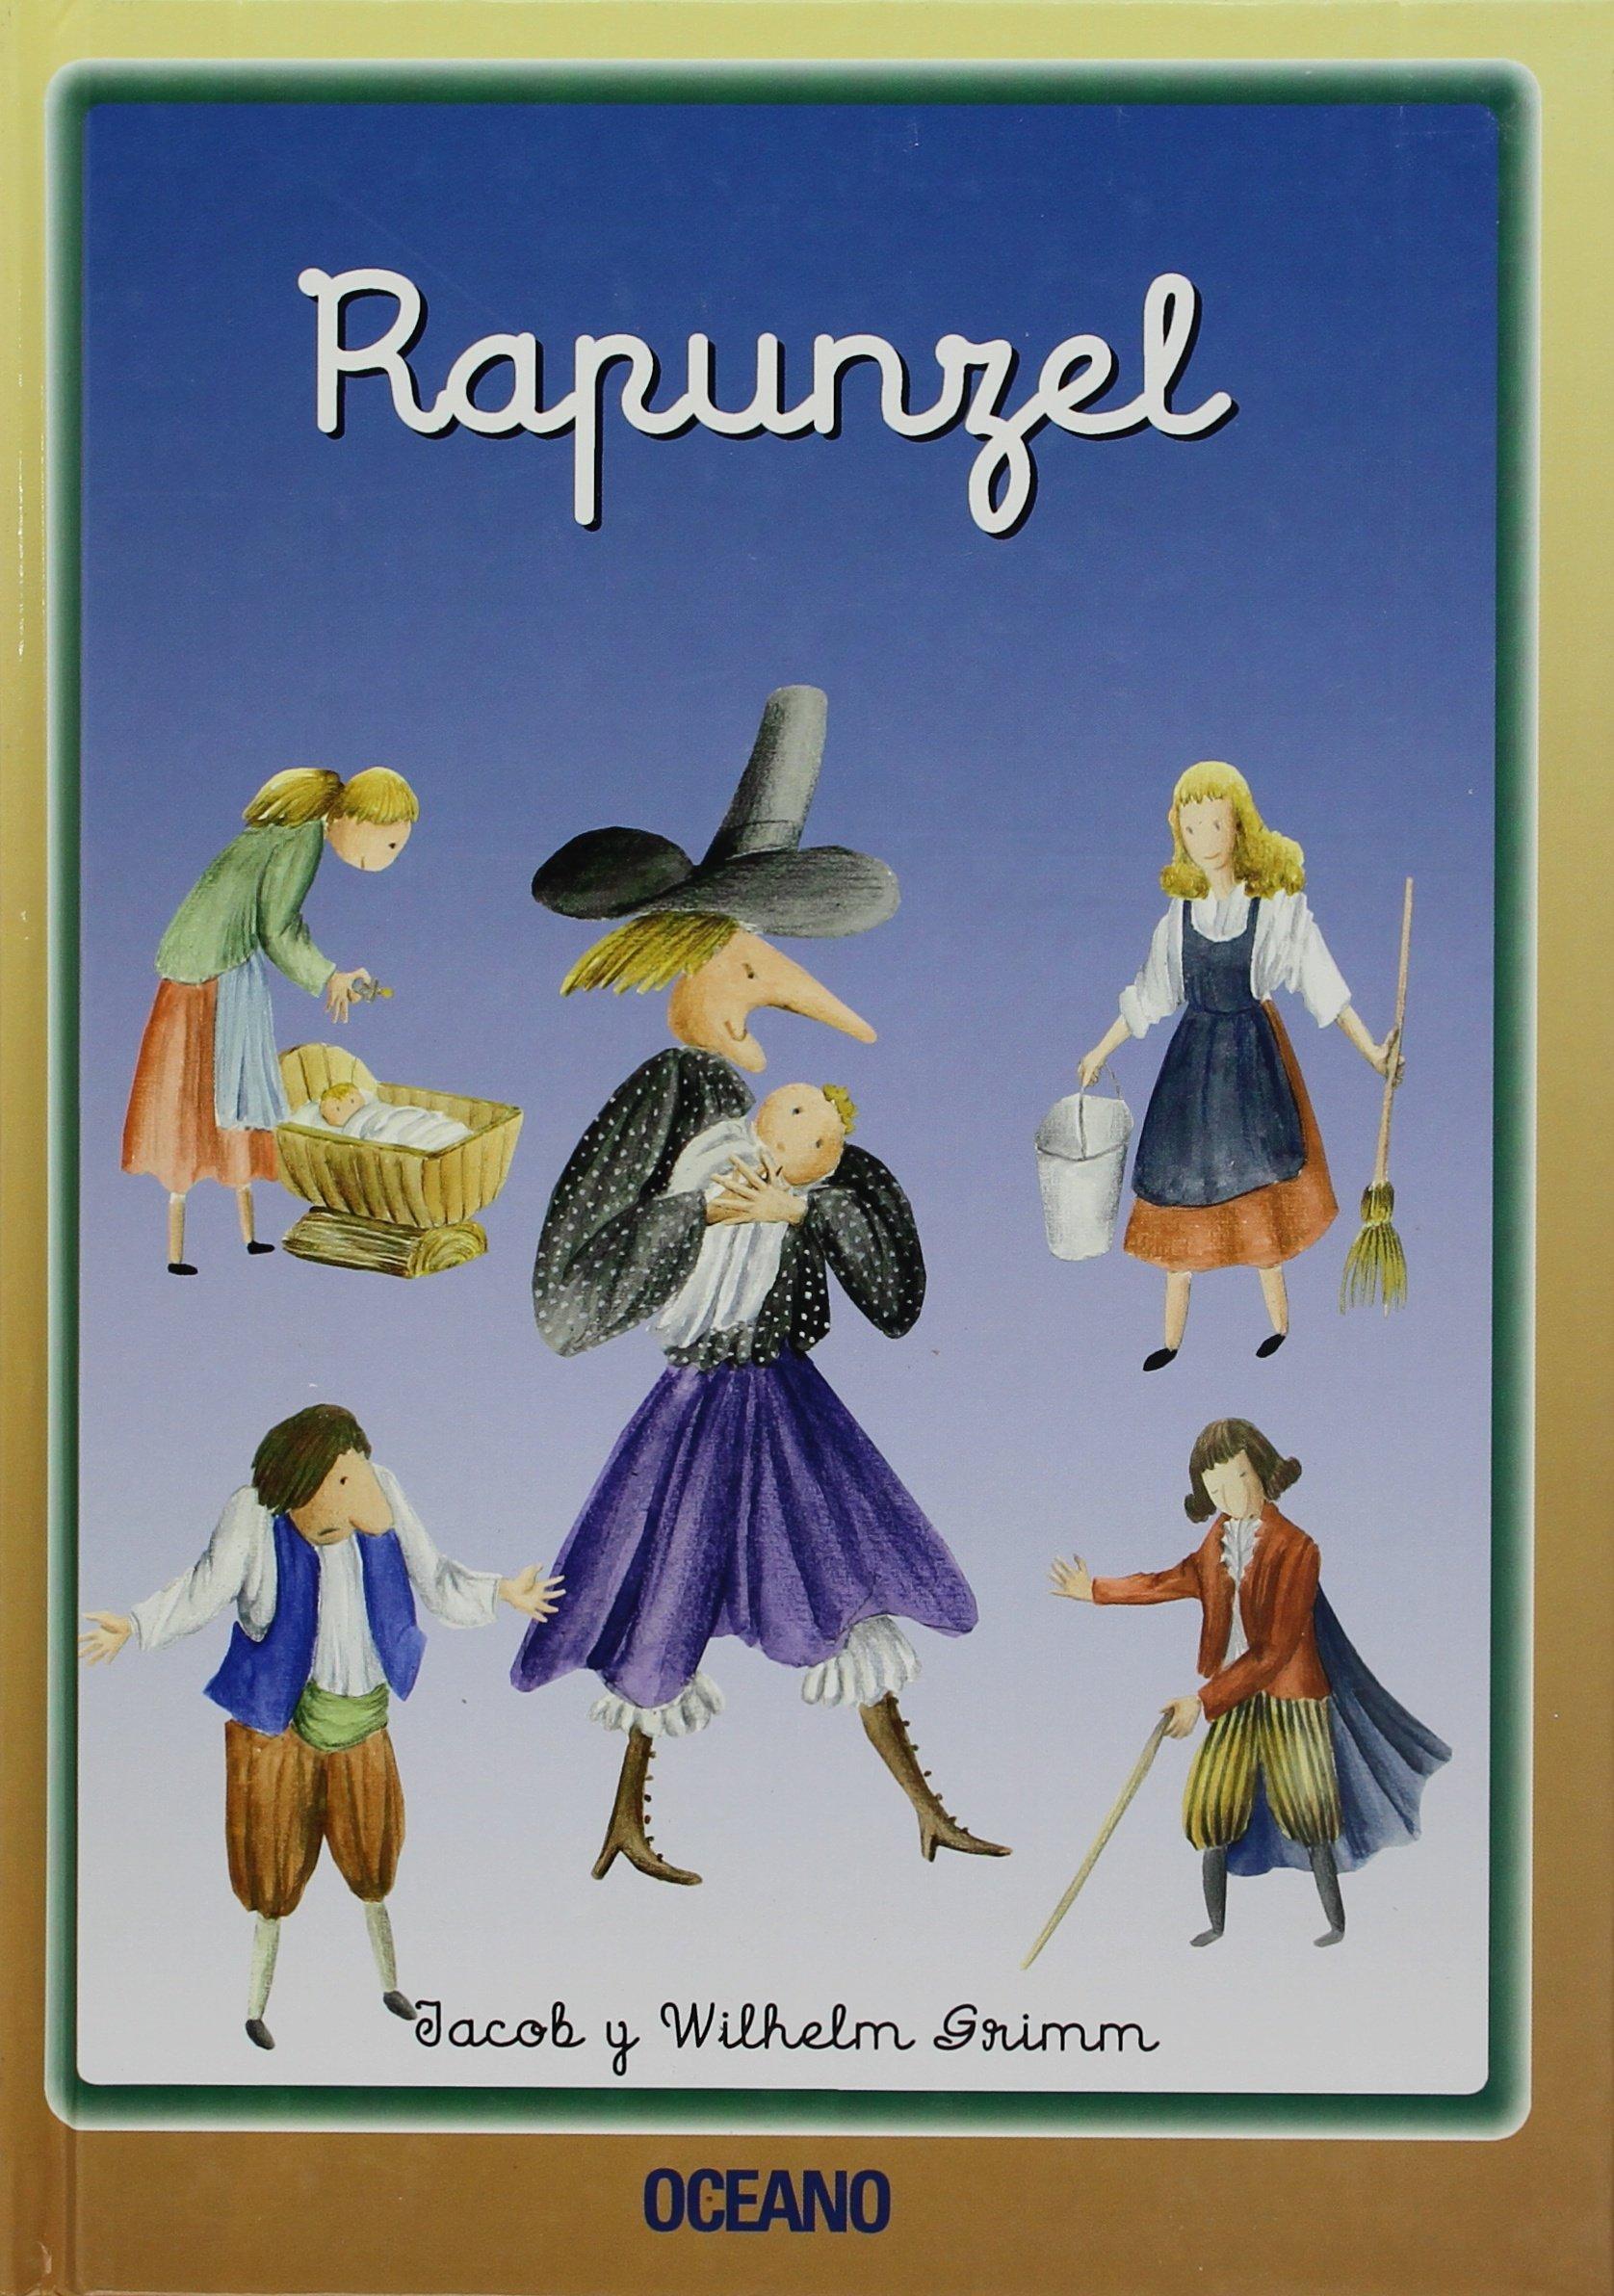 Rapunzel (Cuentos interactivos) (Spanish Edition) (Spanish) Hardcover – January 2, 2005